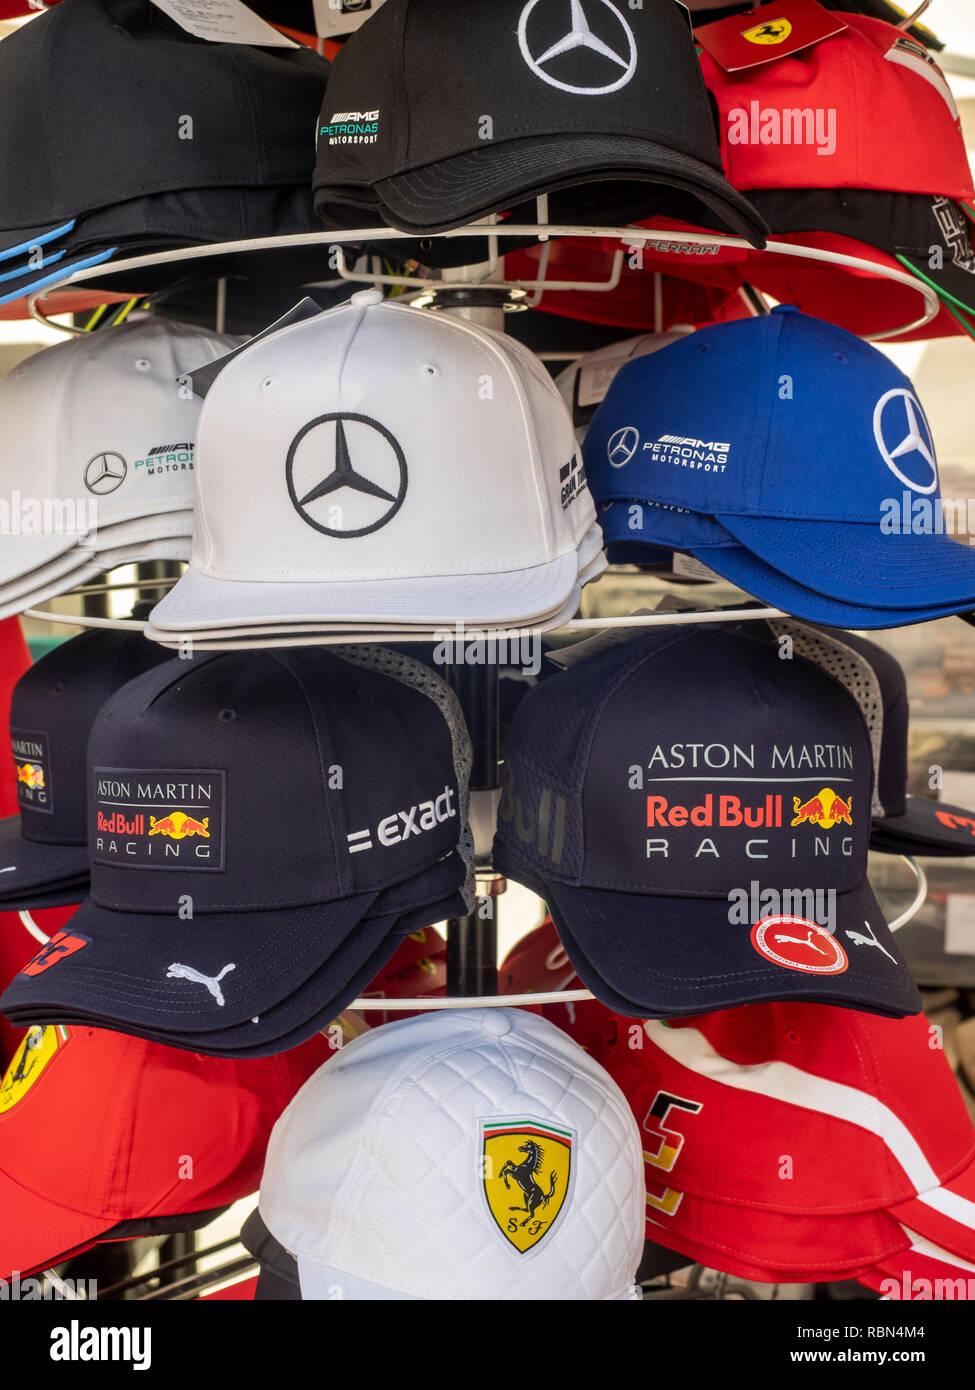 787878bb Baseball Caps Stock Photos & Baseball Caps Stock Images - Alamy